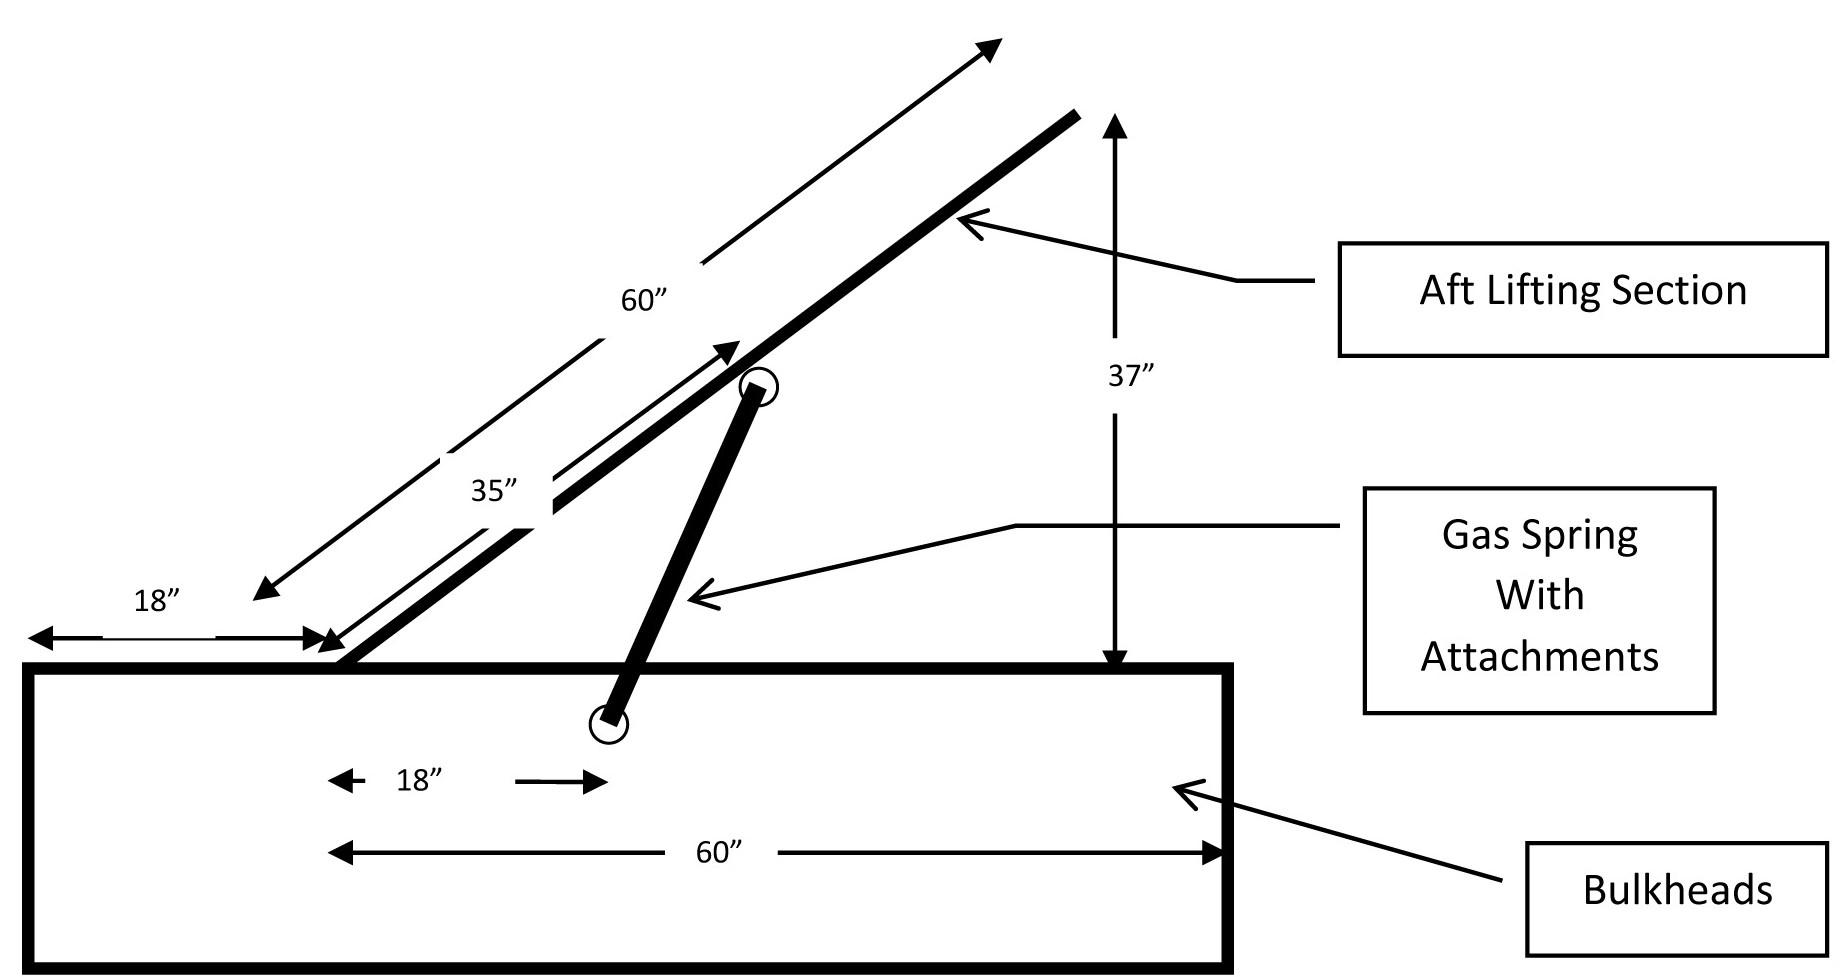 lift-bed-deck-schematic-2-croped